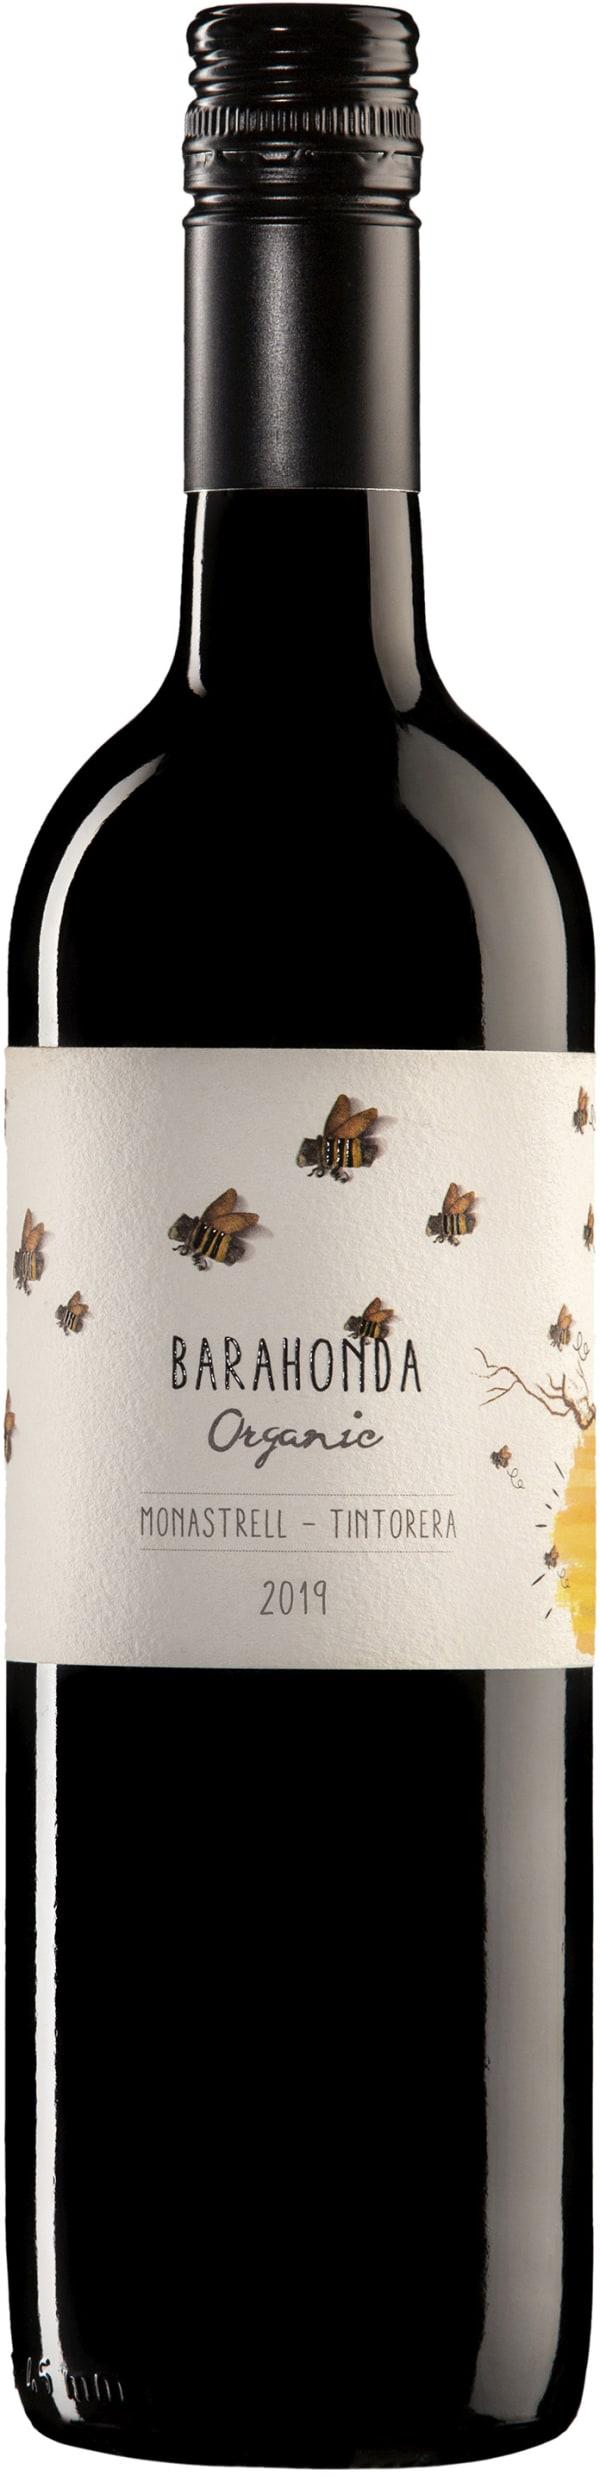 Barahonda Organic Monastrell Tintorera 2019